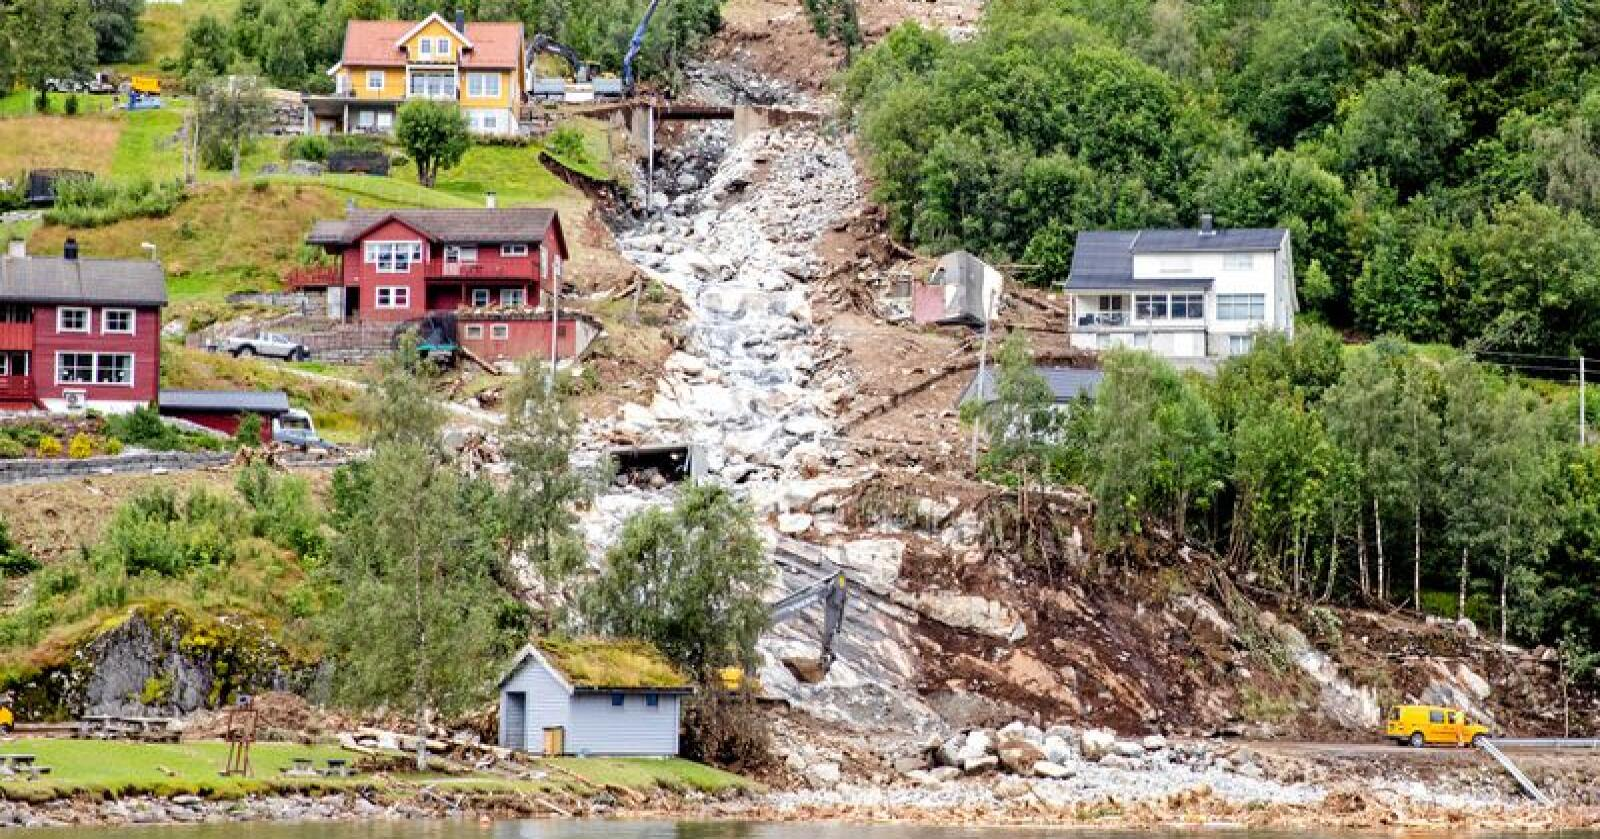 Jordraset i Jølster i Sogn og Fjordane fikk tragiske følger. Foto: Audun Braastad / NTB Scanpix